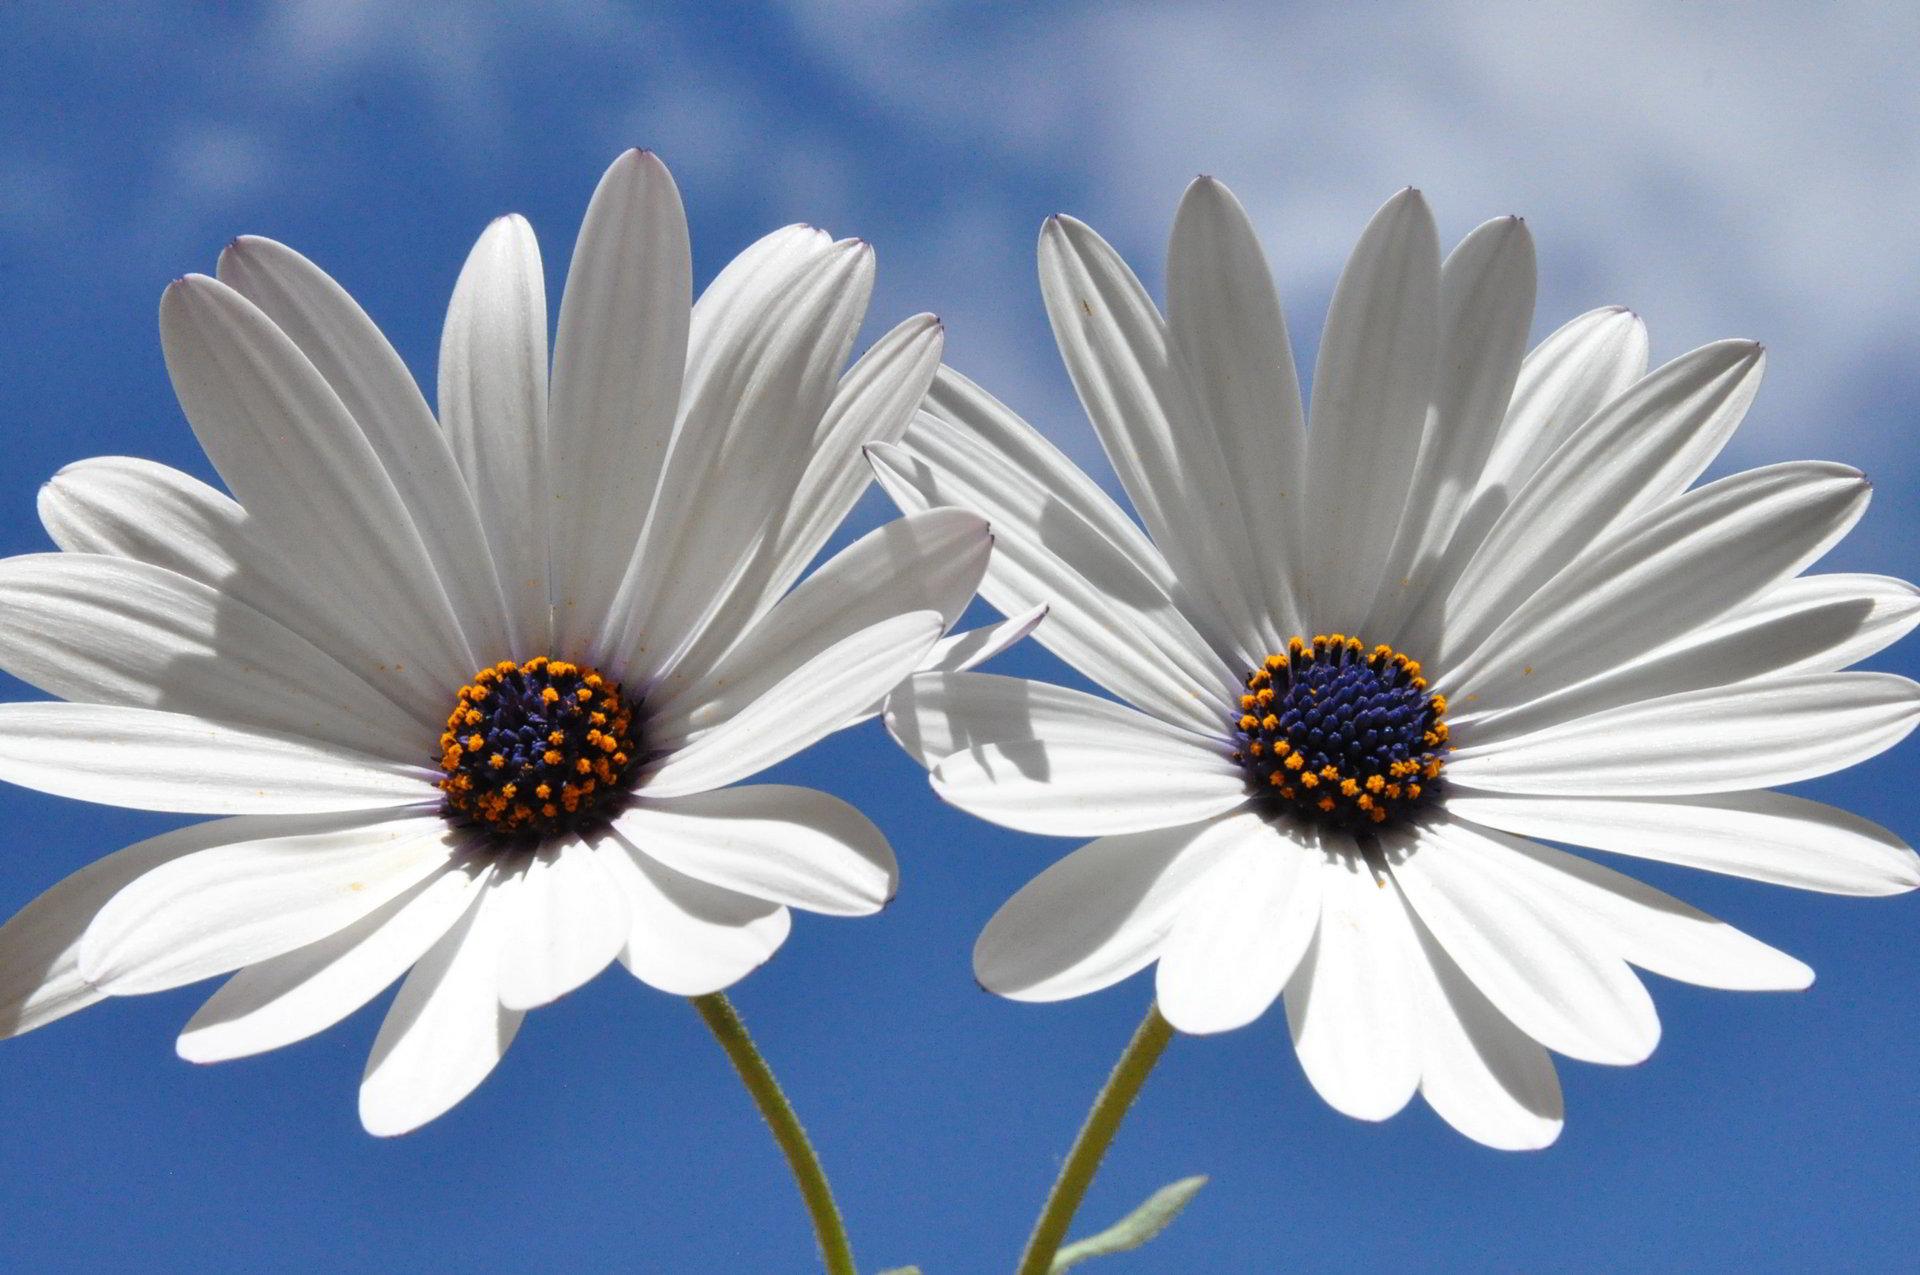 hinh anh hoa cuc dep 68